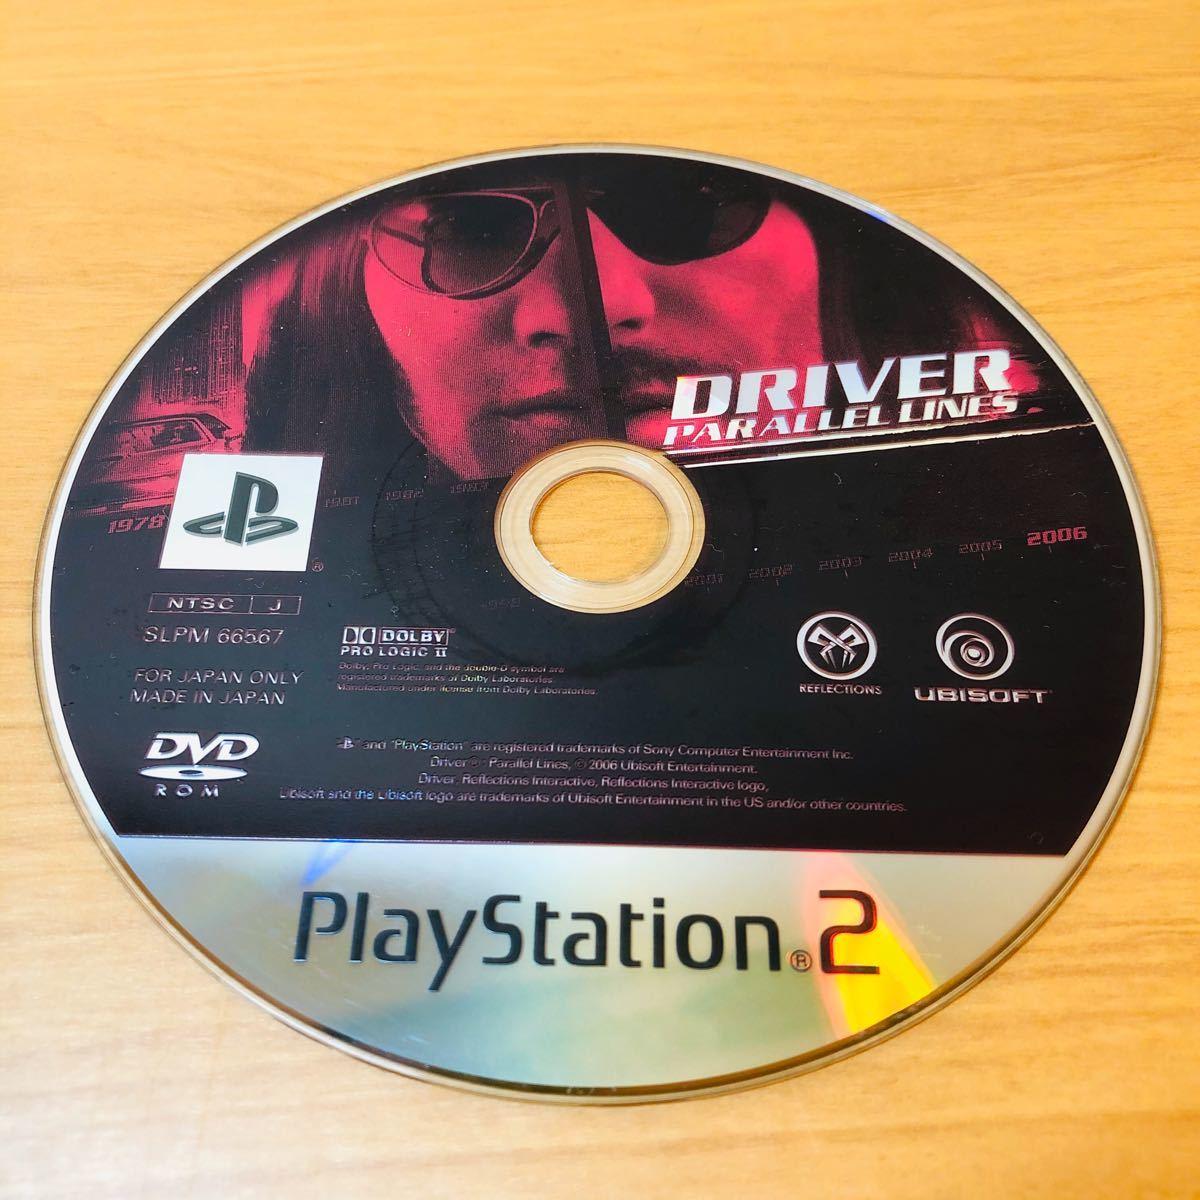 【PS2ソフト】 ドライバー パラレルラインズ